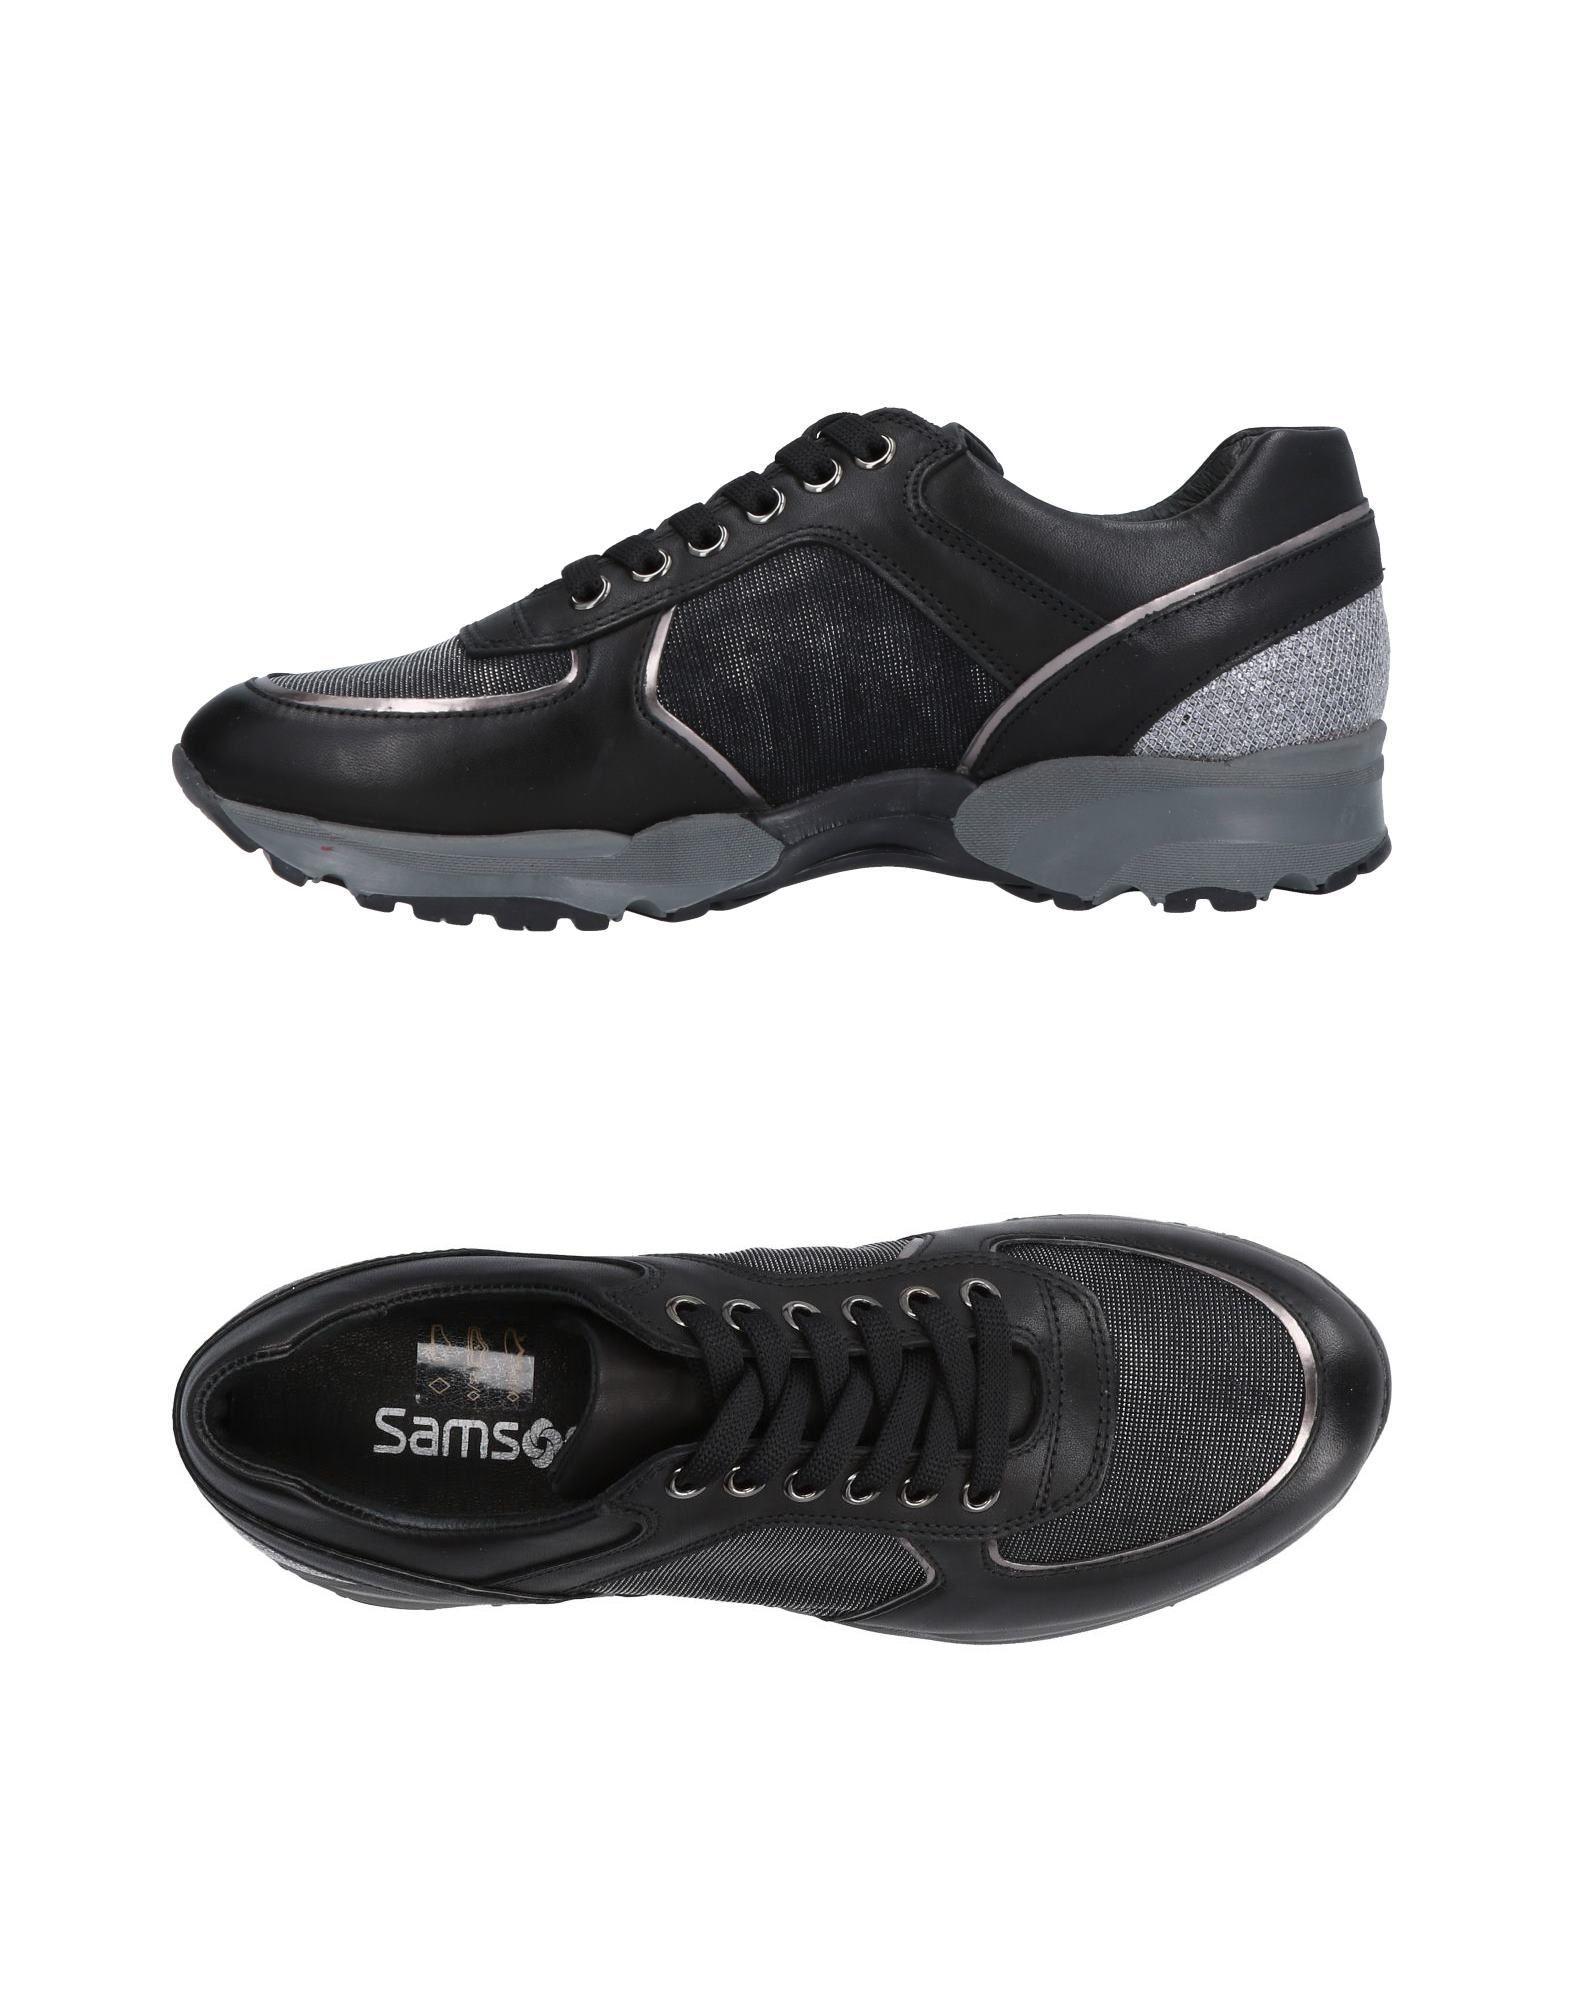 Samsonite Sneakers Damen  beliebte 11468323KB Gute Qualität beliebte  Schuhe f0967d